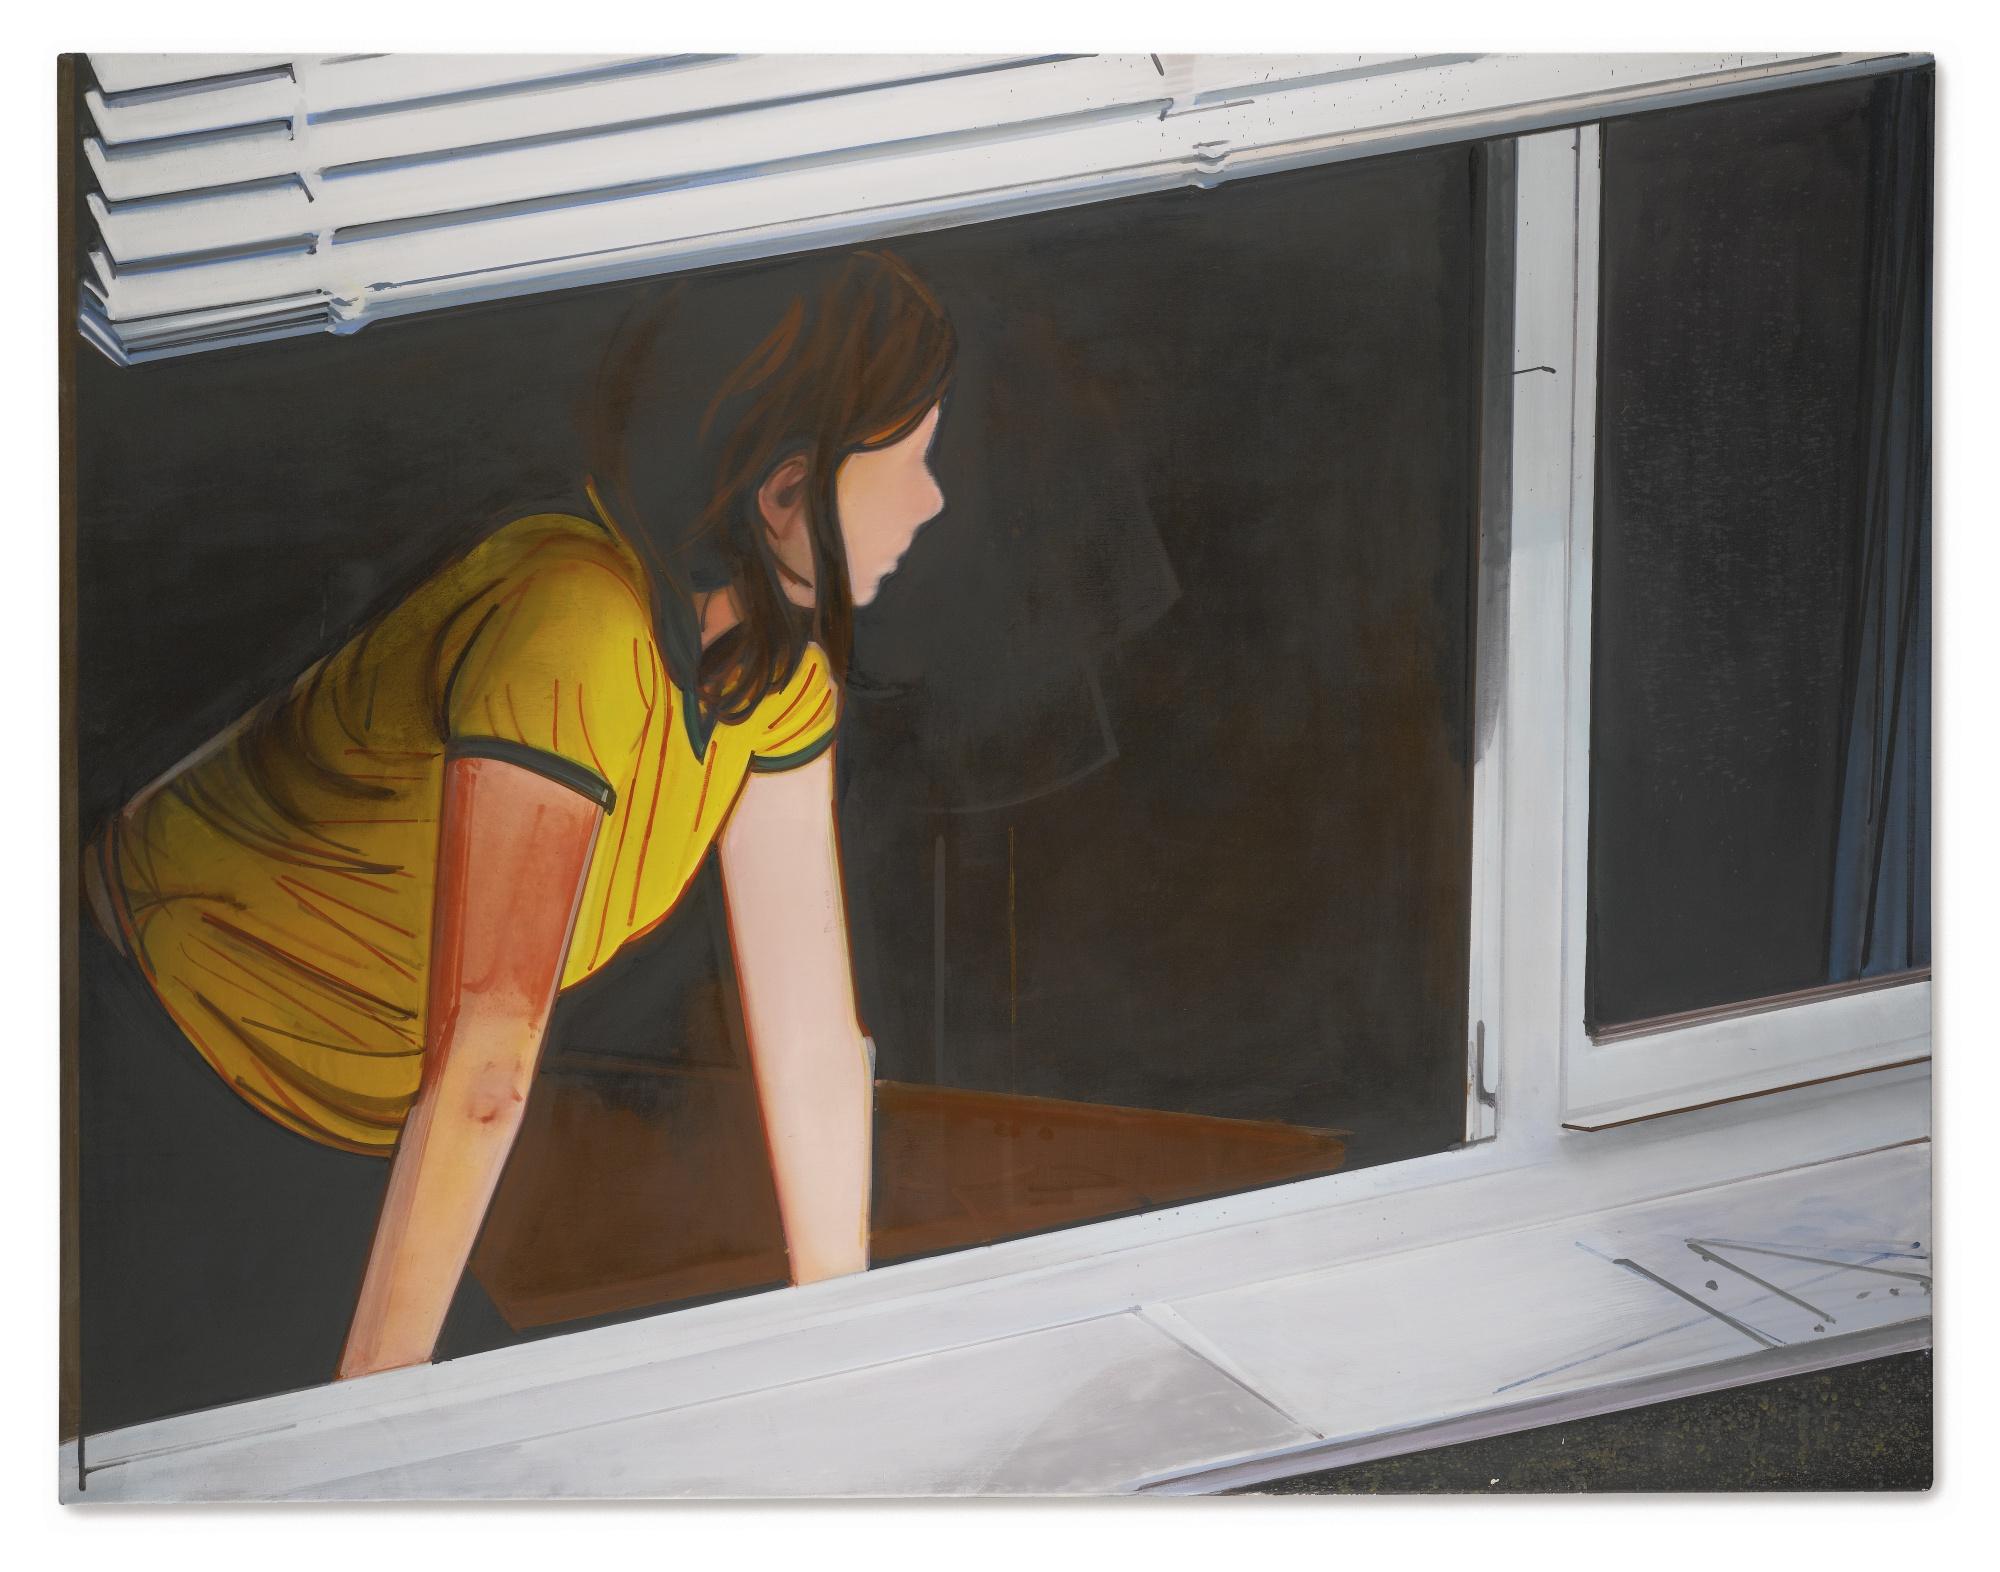 Thoralf Knobloch-Herbergsfenster-2006